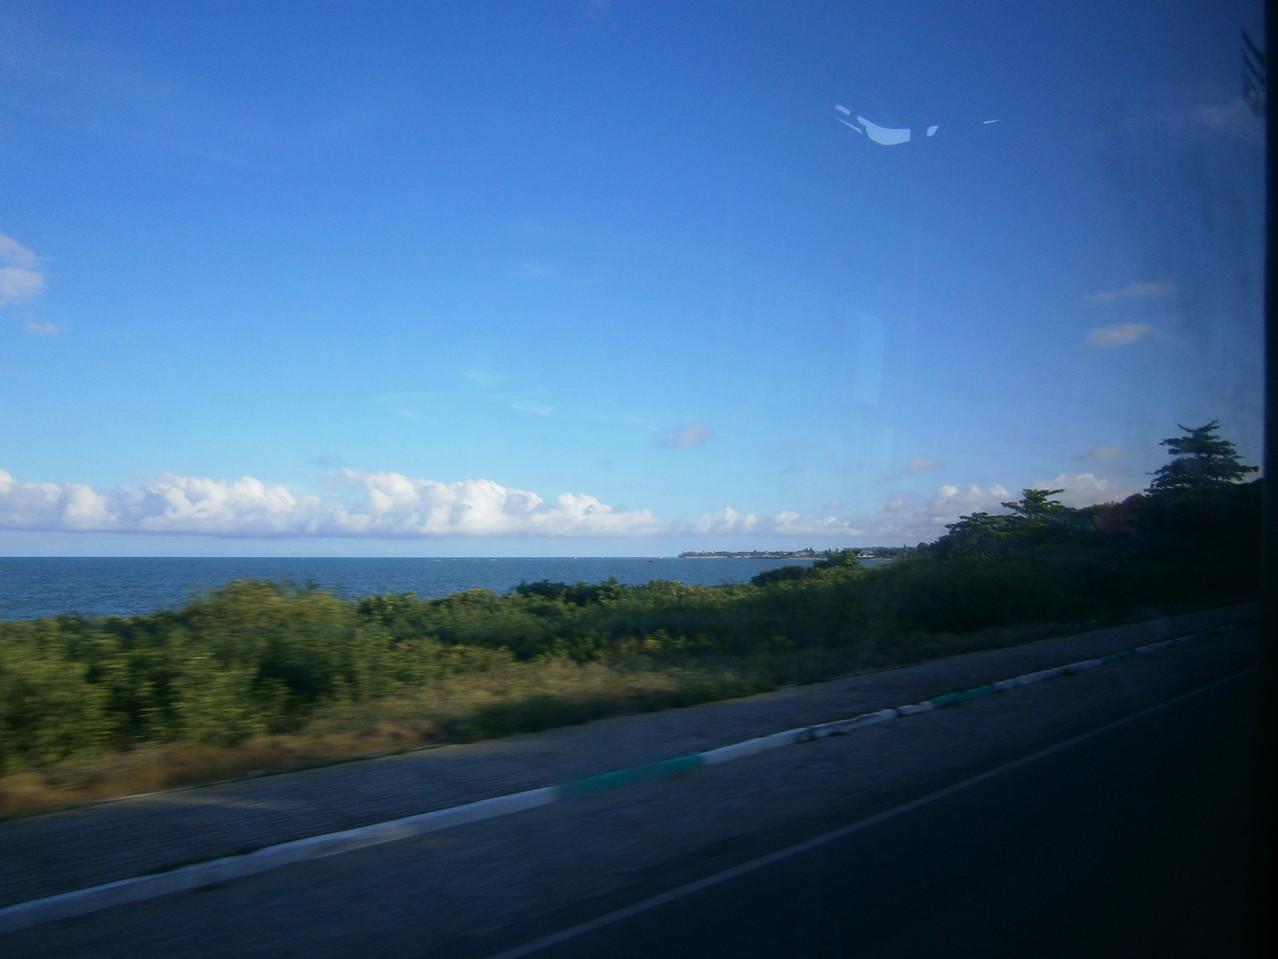 zurück nach Porto Seguro